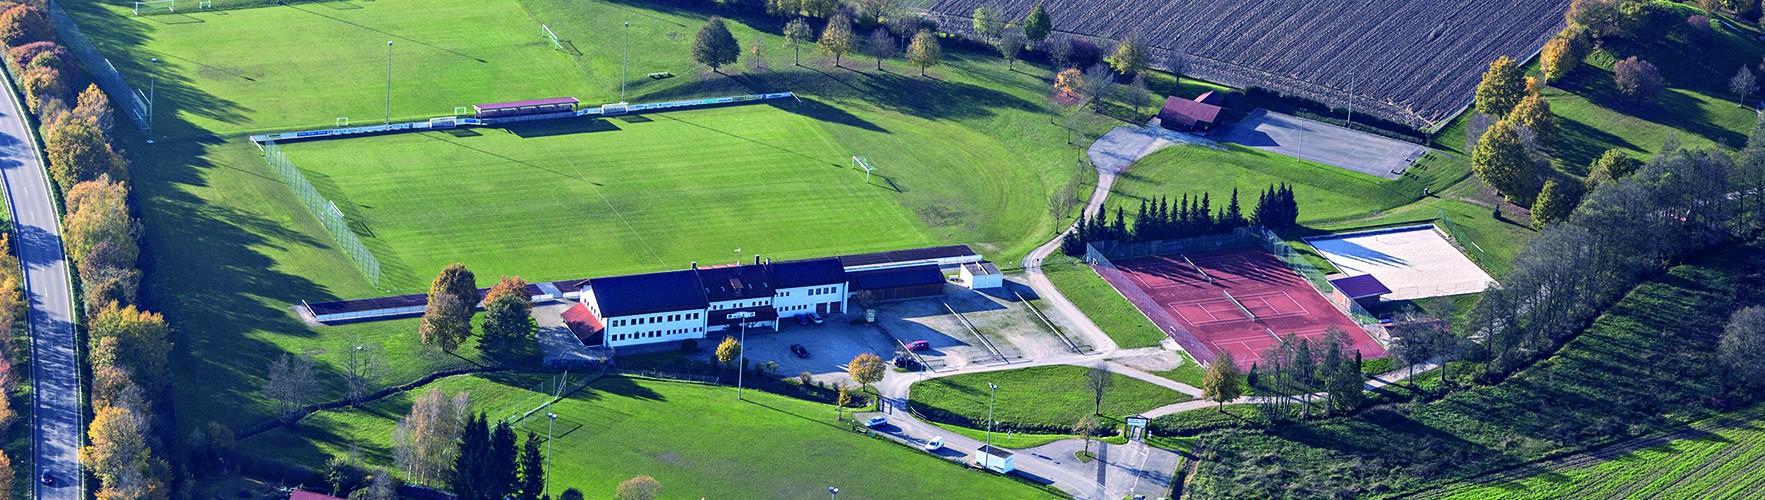 TSV Velden Luftbild - Foto: Klaus Leidorf, www.leidorf.de